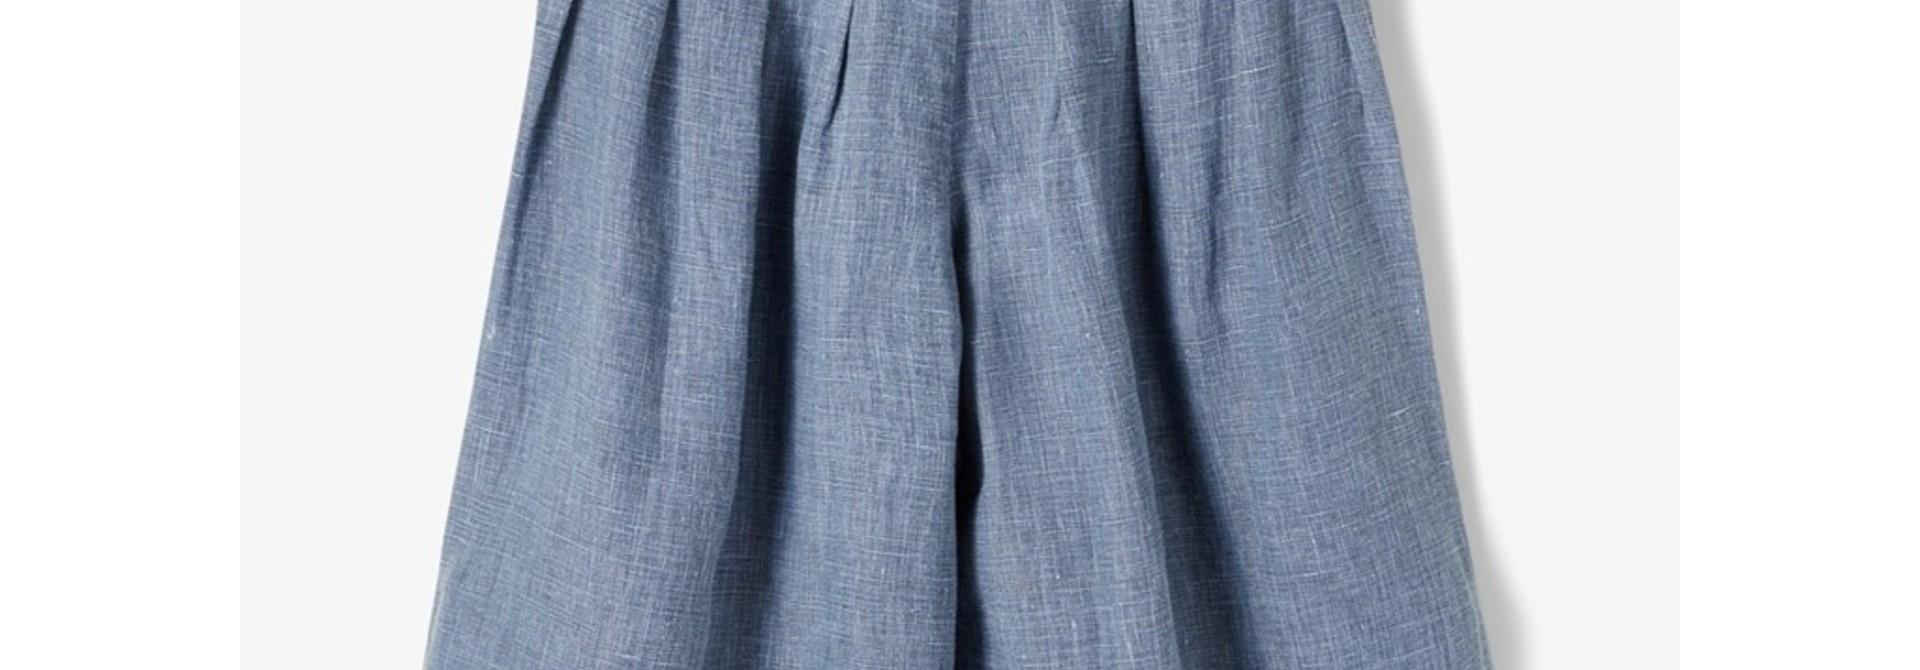 Sally Culotte Pant - Medium Blue Denim